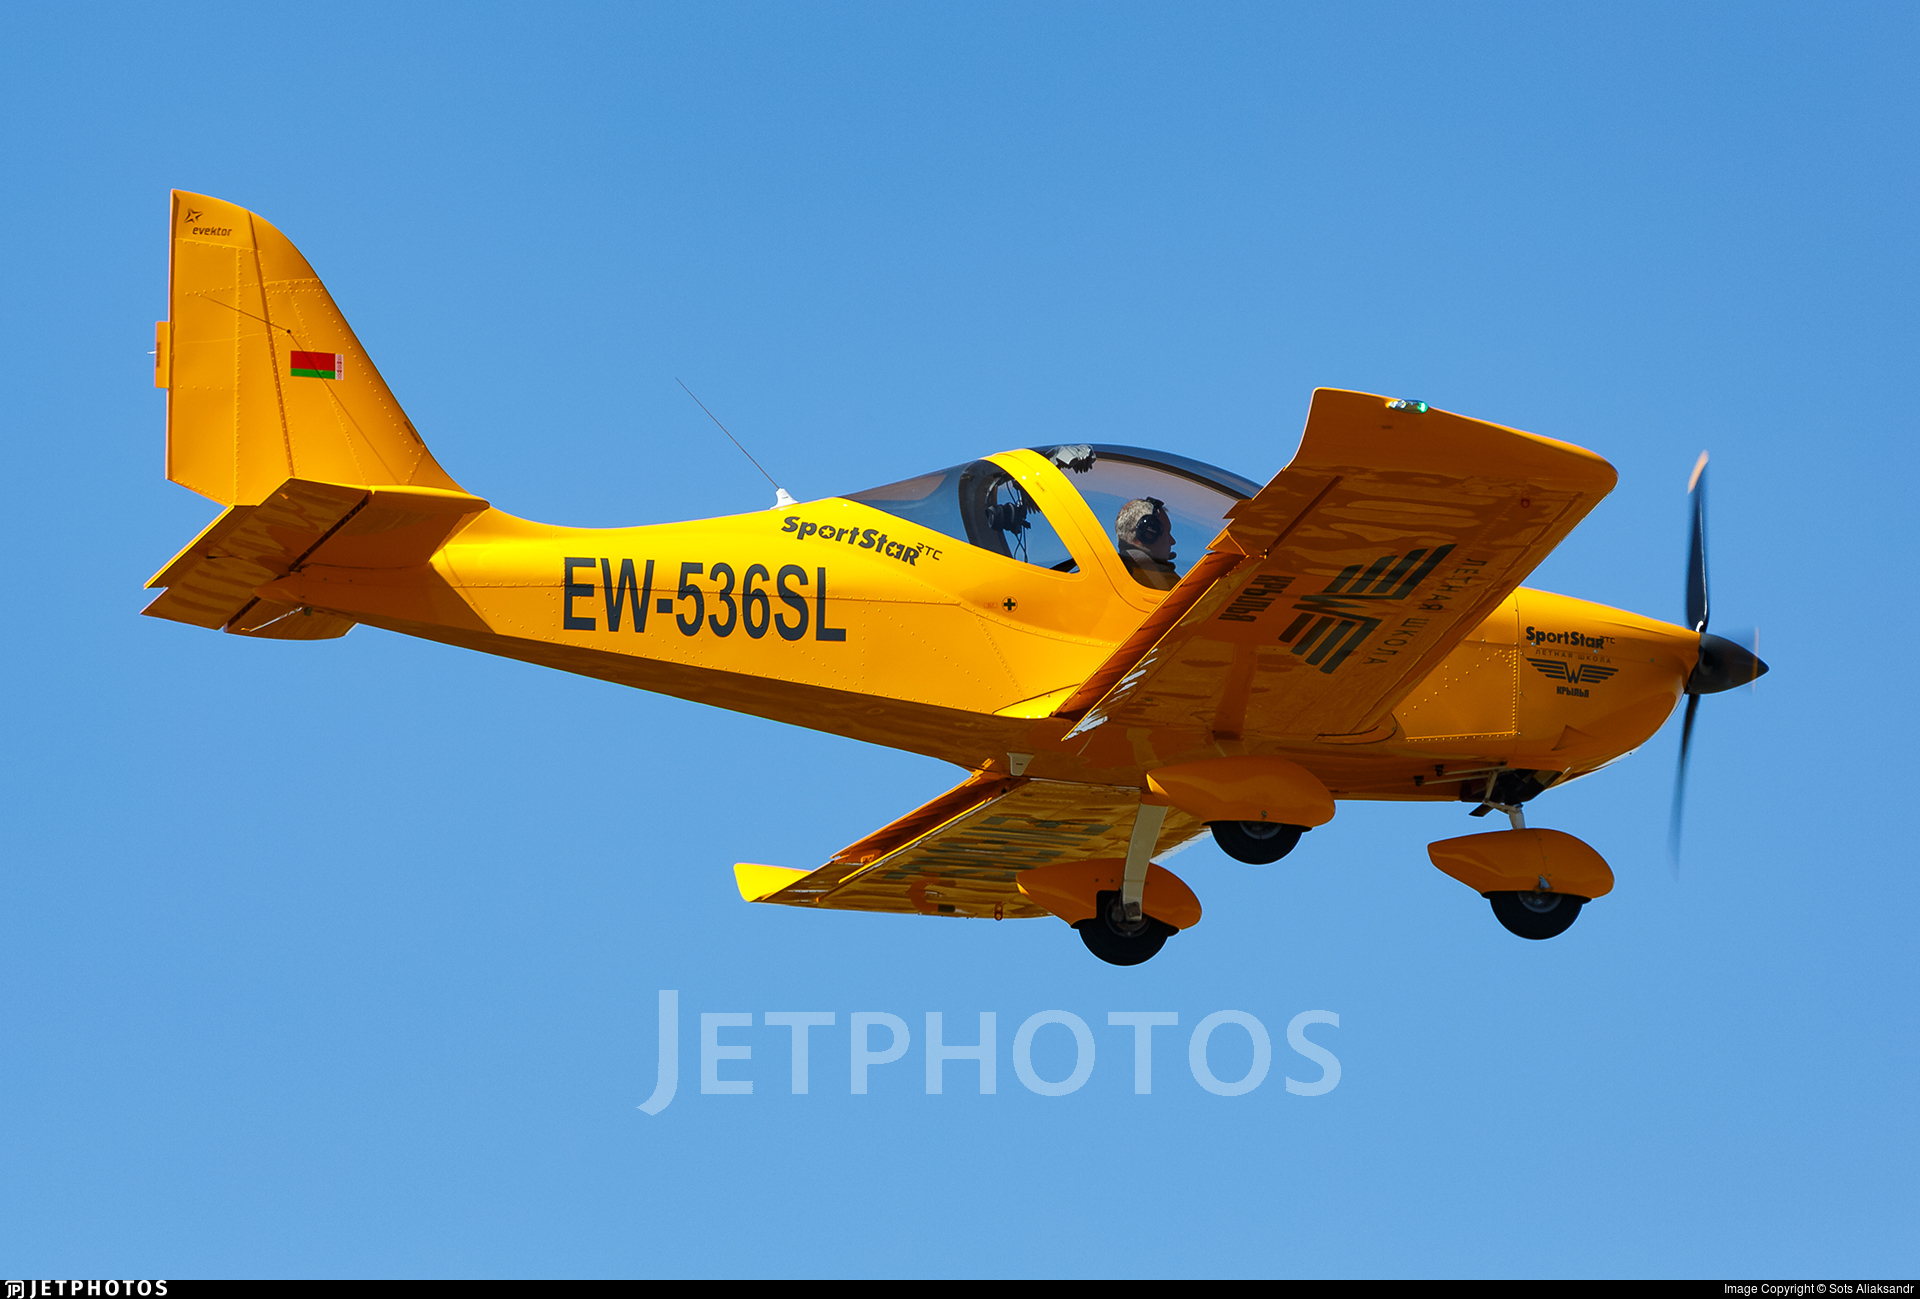 EW-536SL - Evektor-Aerotechnik SportStar RTC - Wings Flying School Belarus